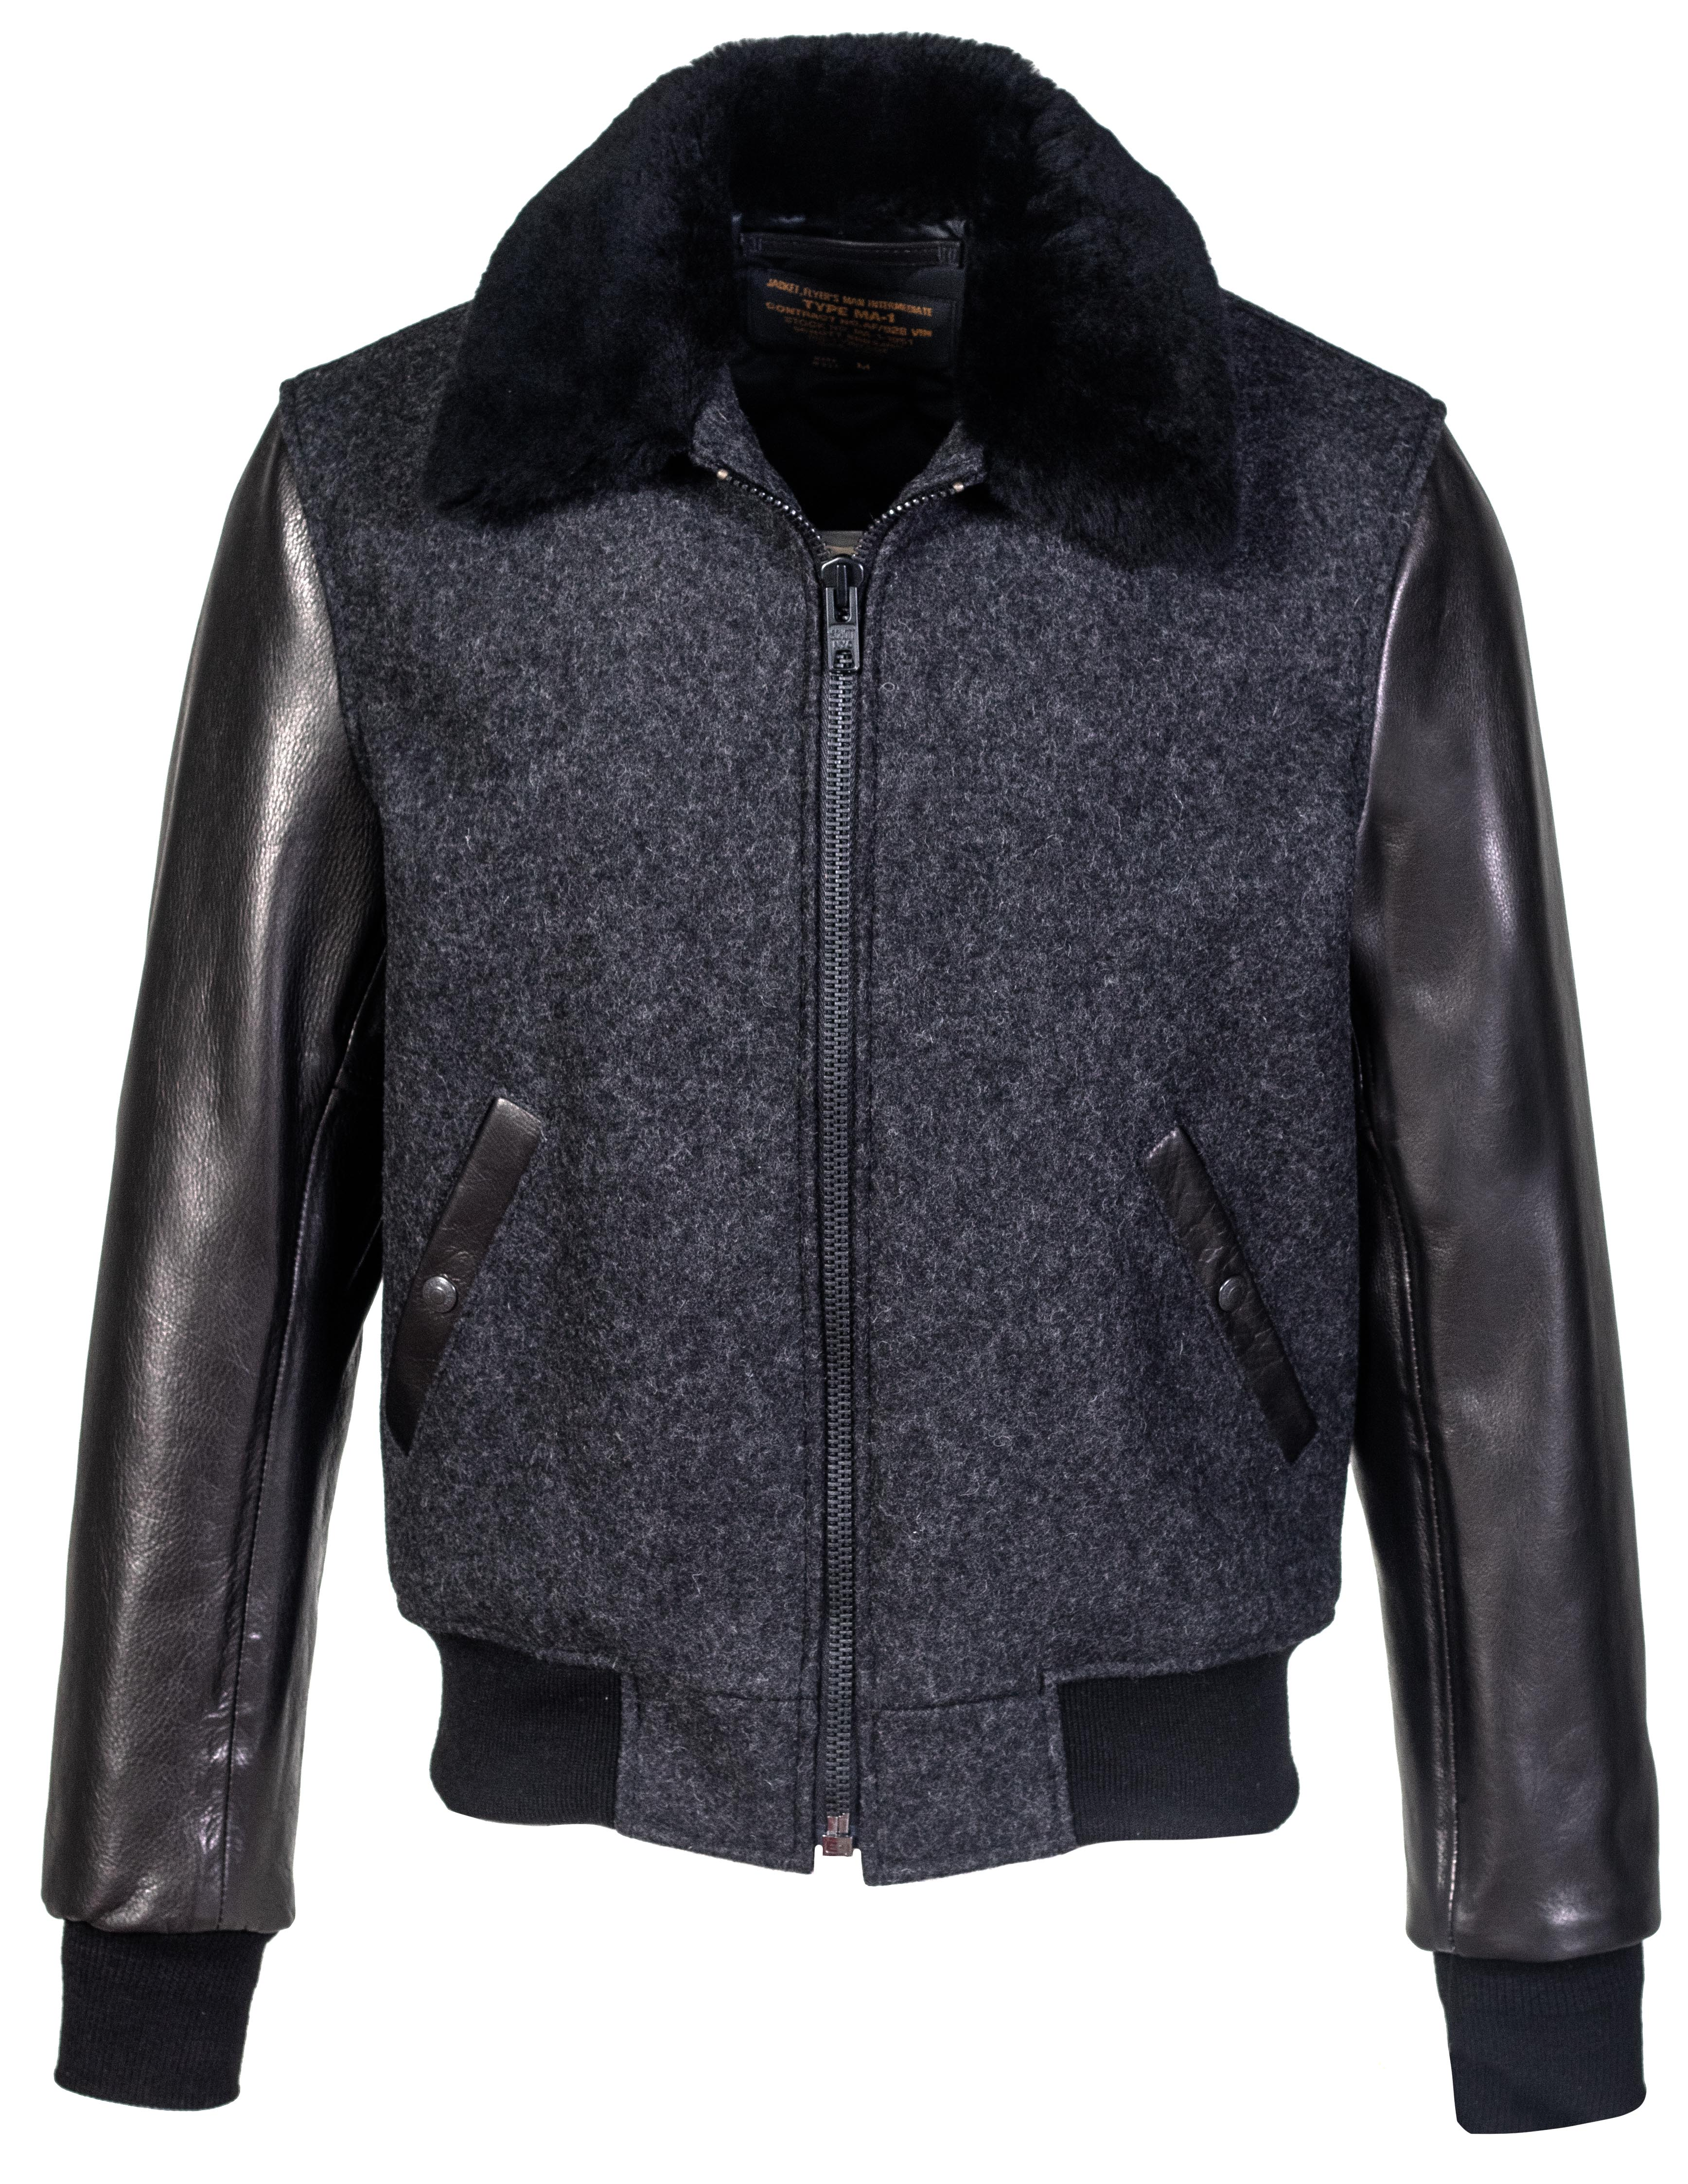 81dd59d91 Schott N.Y.C. 793 Men's B-15 Style Wool Jacket, Leather Sleeves and Genuine  Sheepskin Collar - Dark Oxford Grey Size S